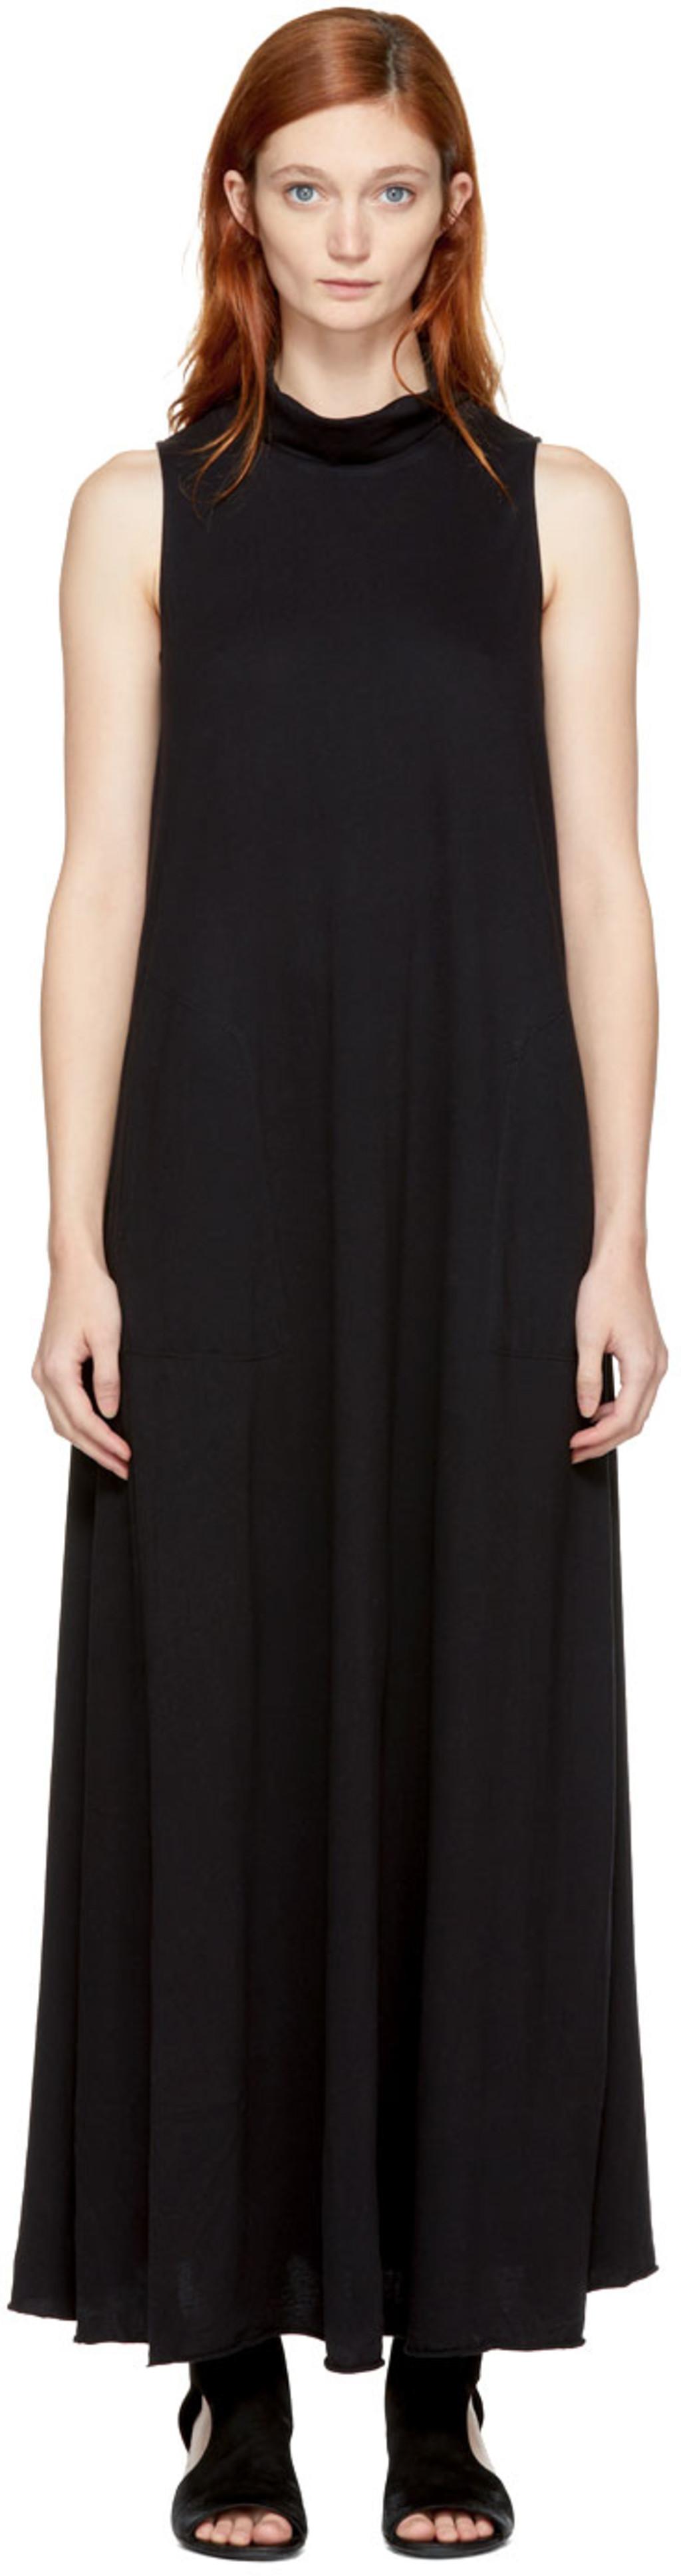 Ivory Long Turtleneck Dress Raquel Allegra yf0SMpjoEM